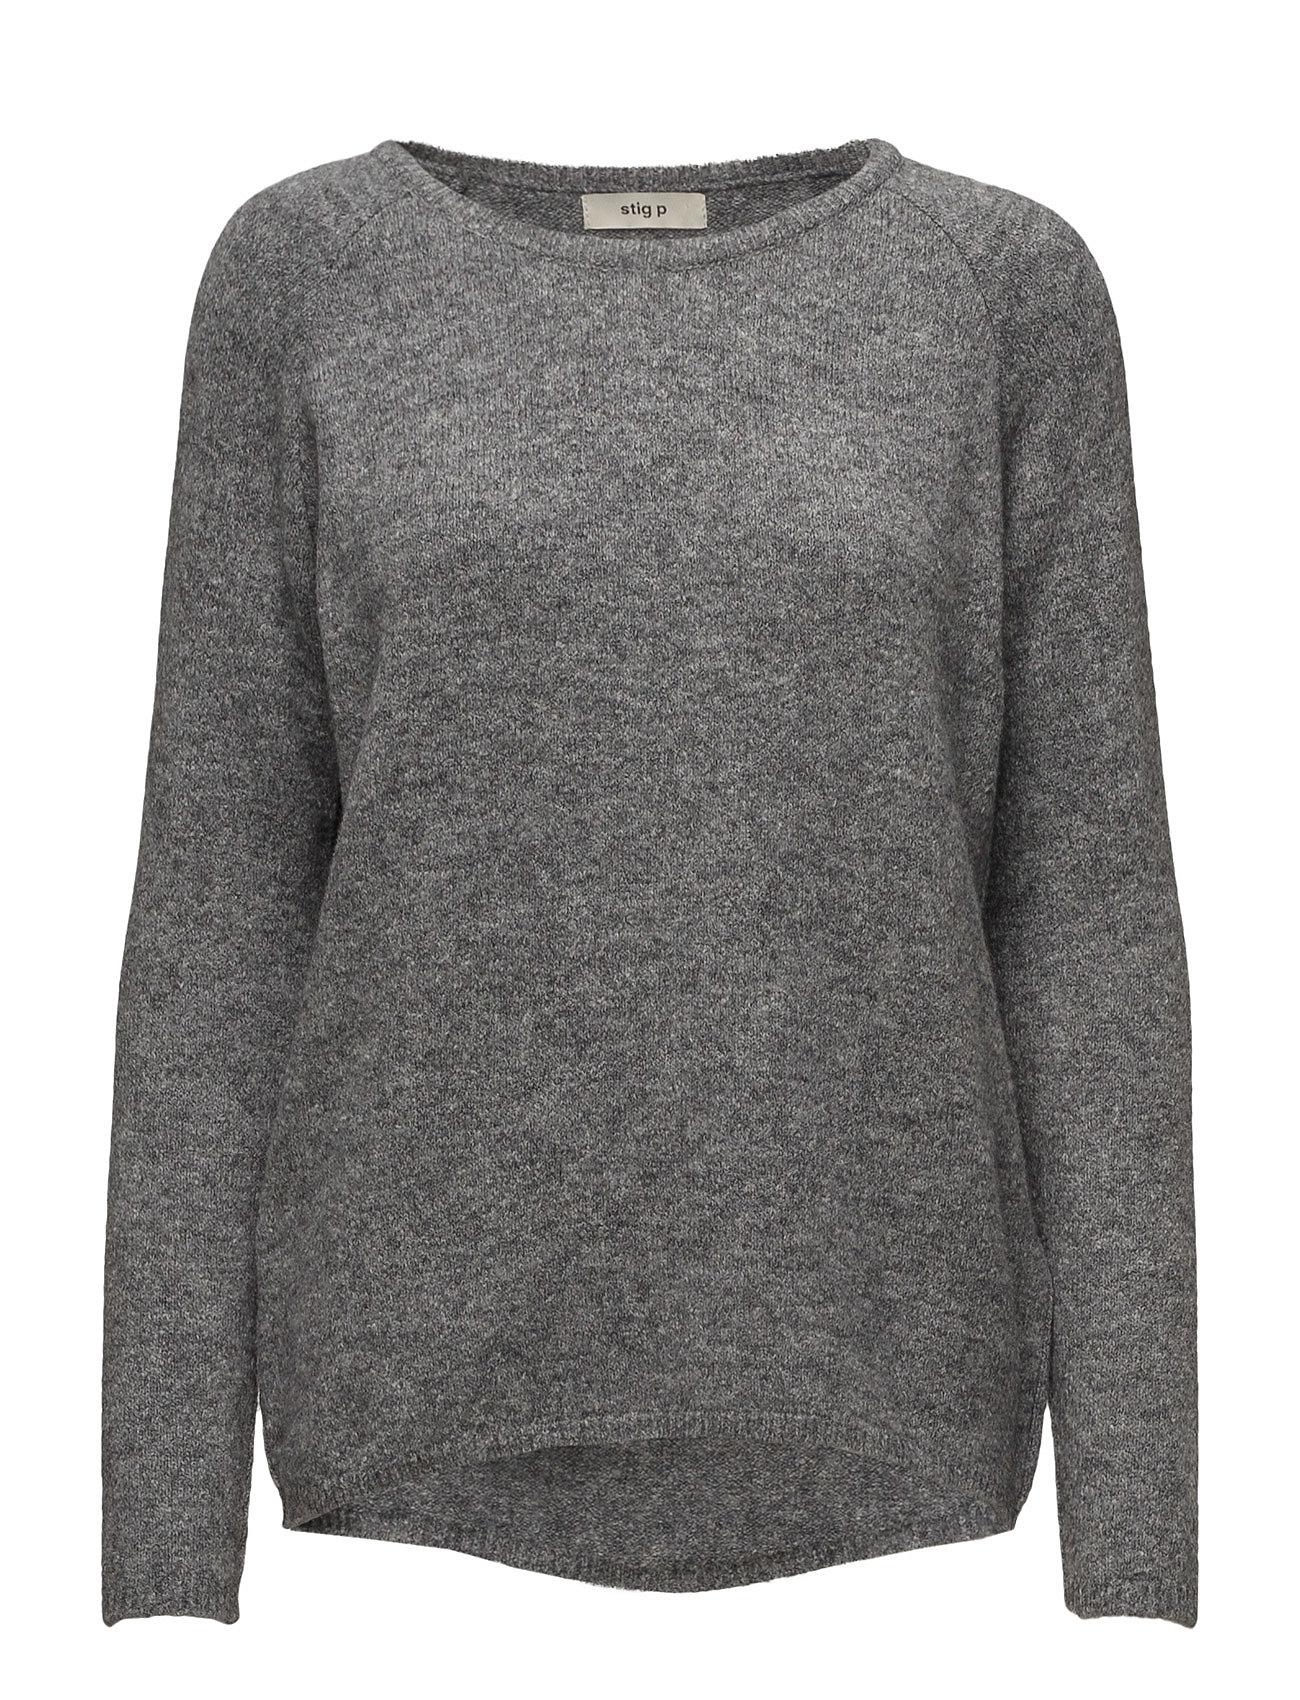 Yail Stig P Sweatshirts til Damer i